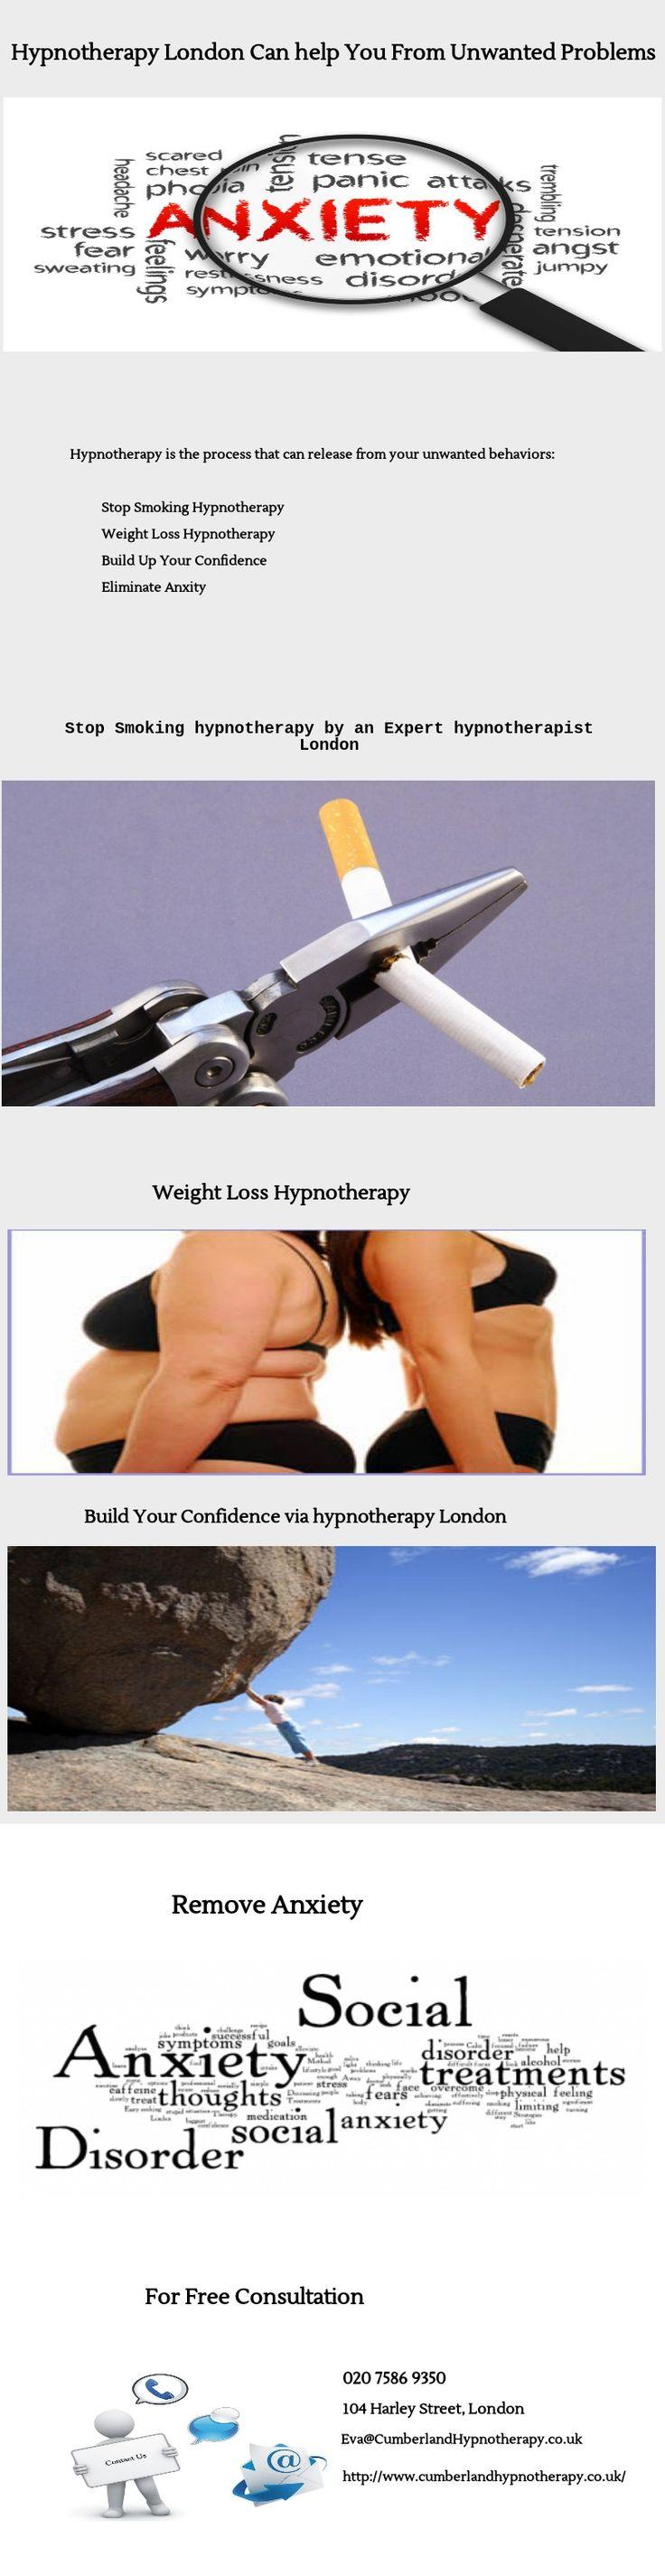 Hypnotherapy London - http://www.advancedhypnosislondon.com